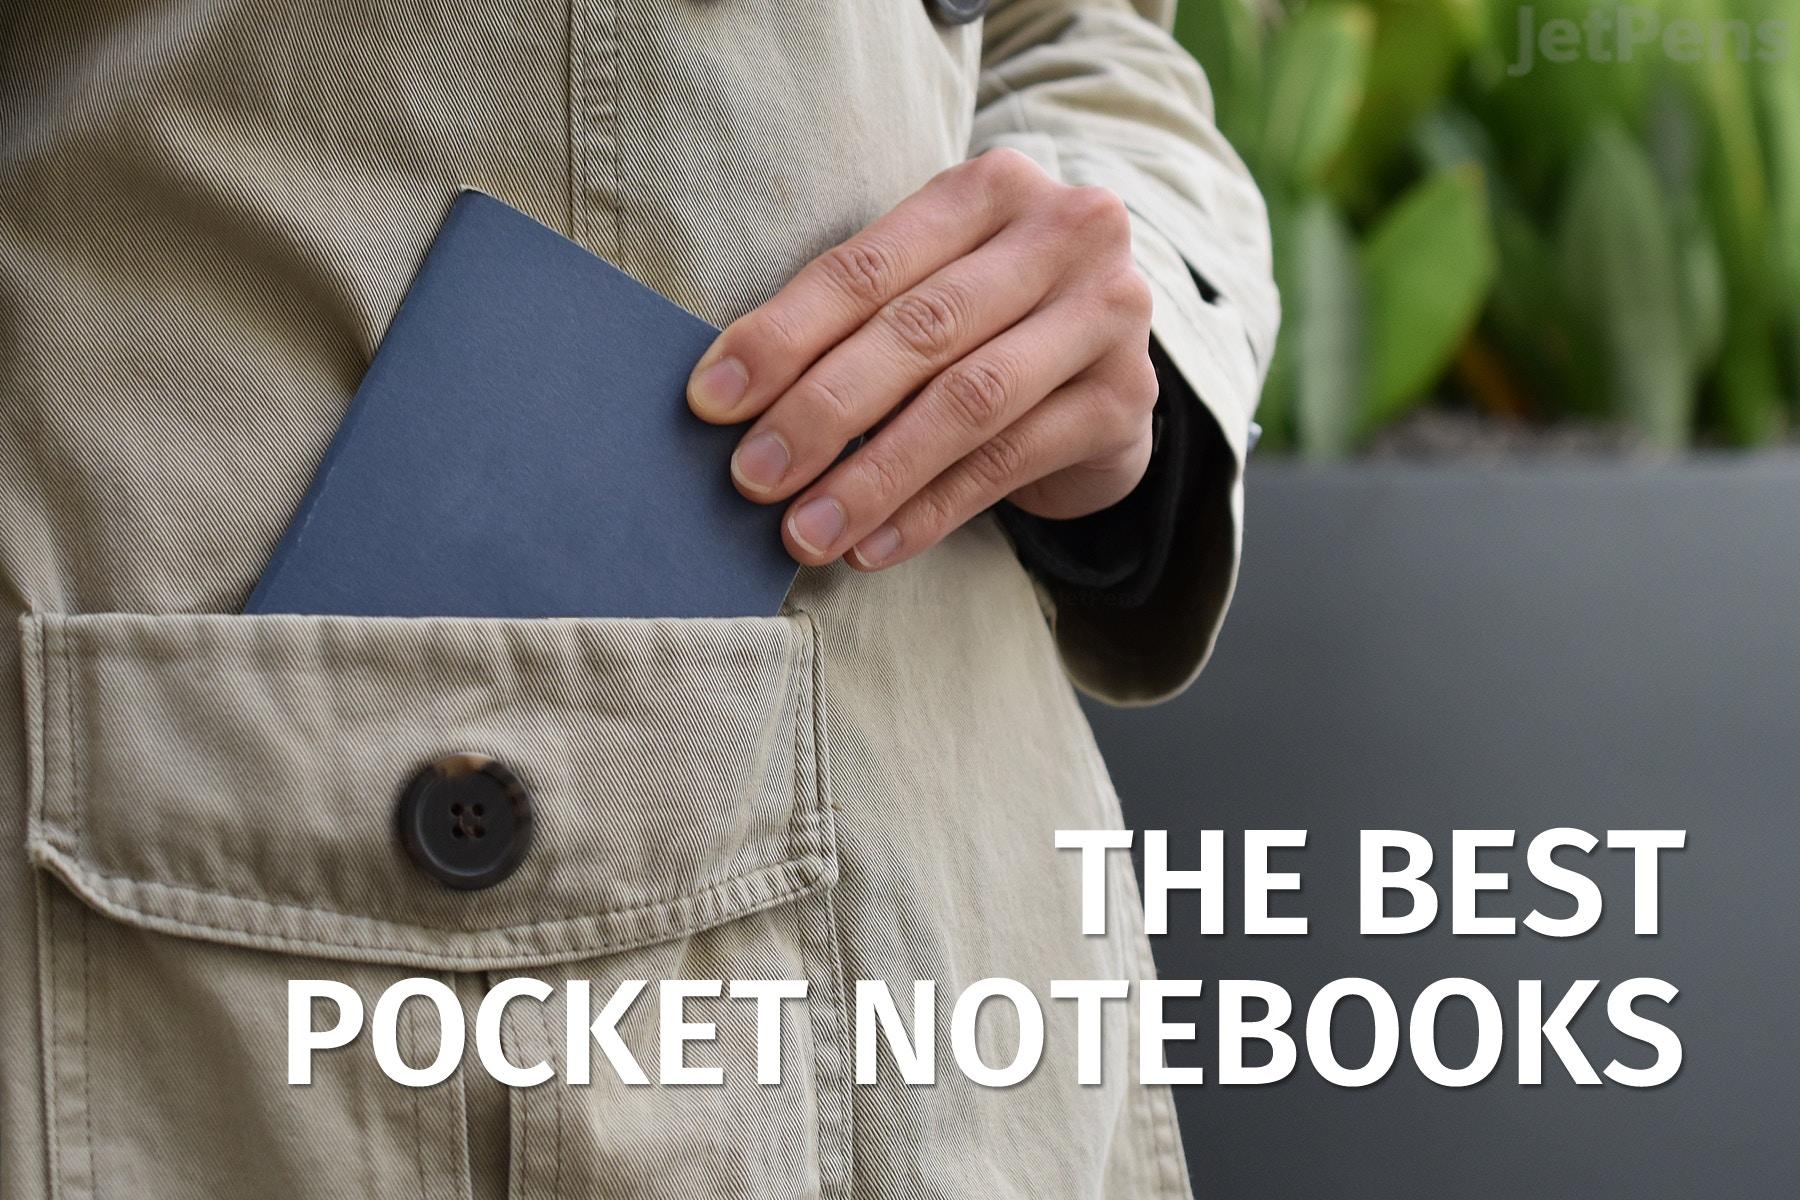 The Best Pocket Notebooks for 2020